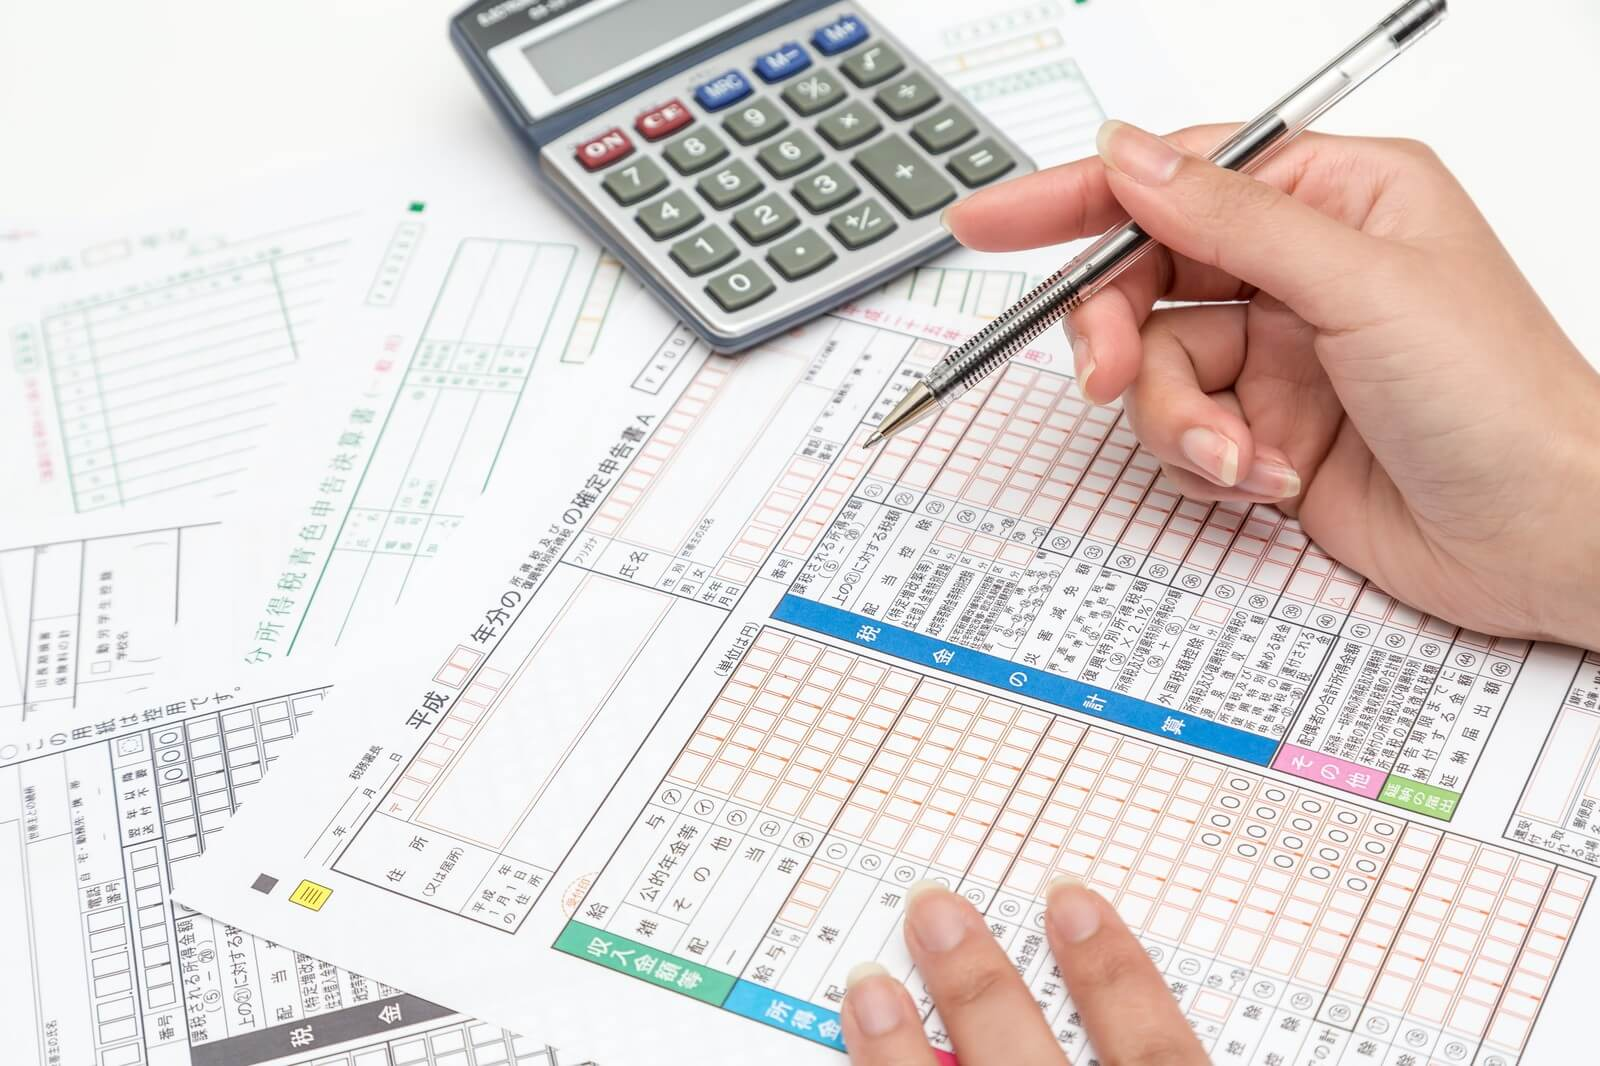 H28年度不動産売却をした場合の確定申告記入方法